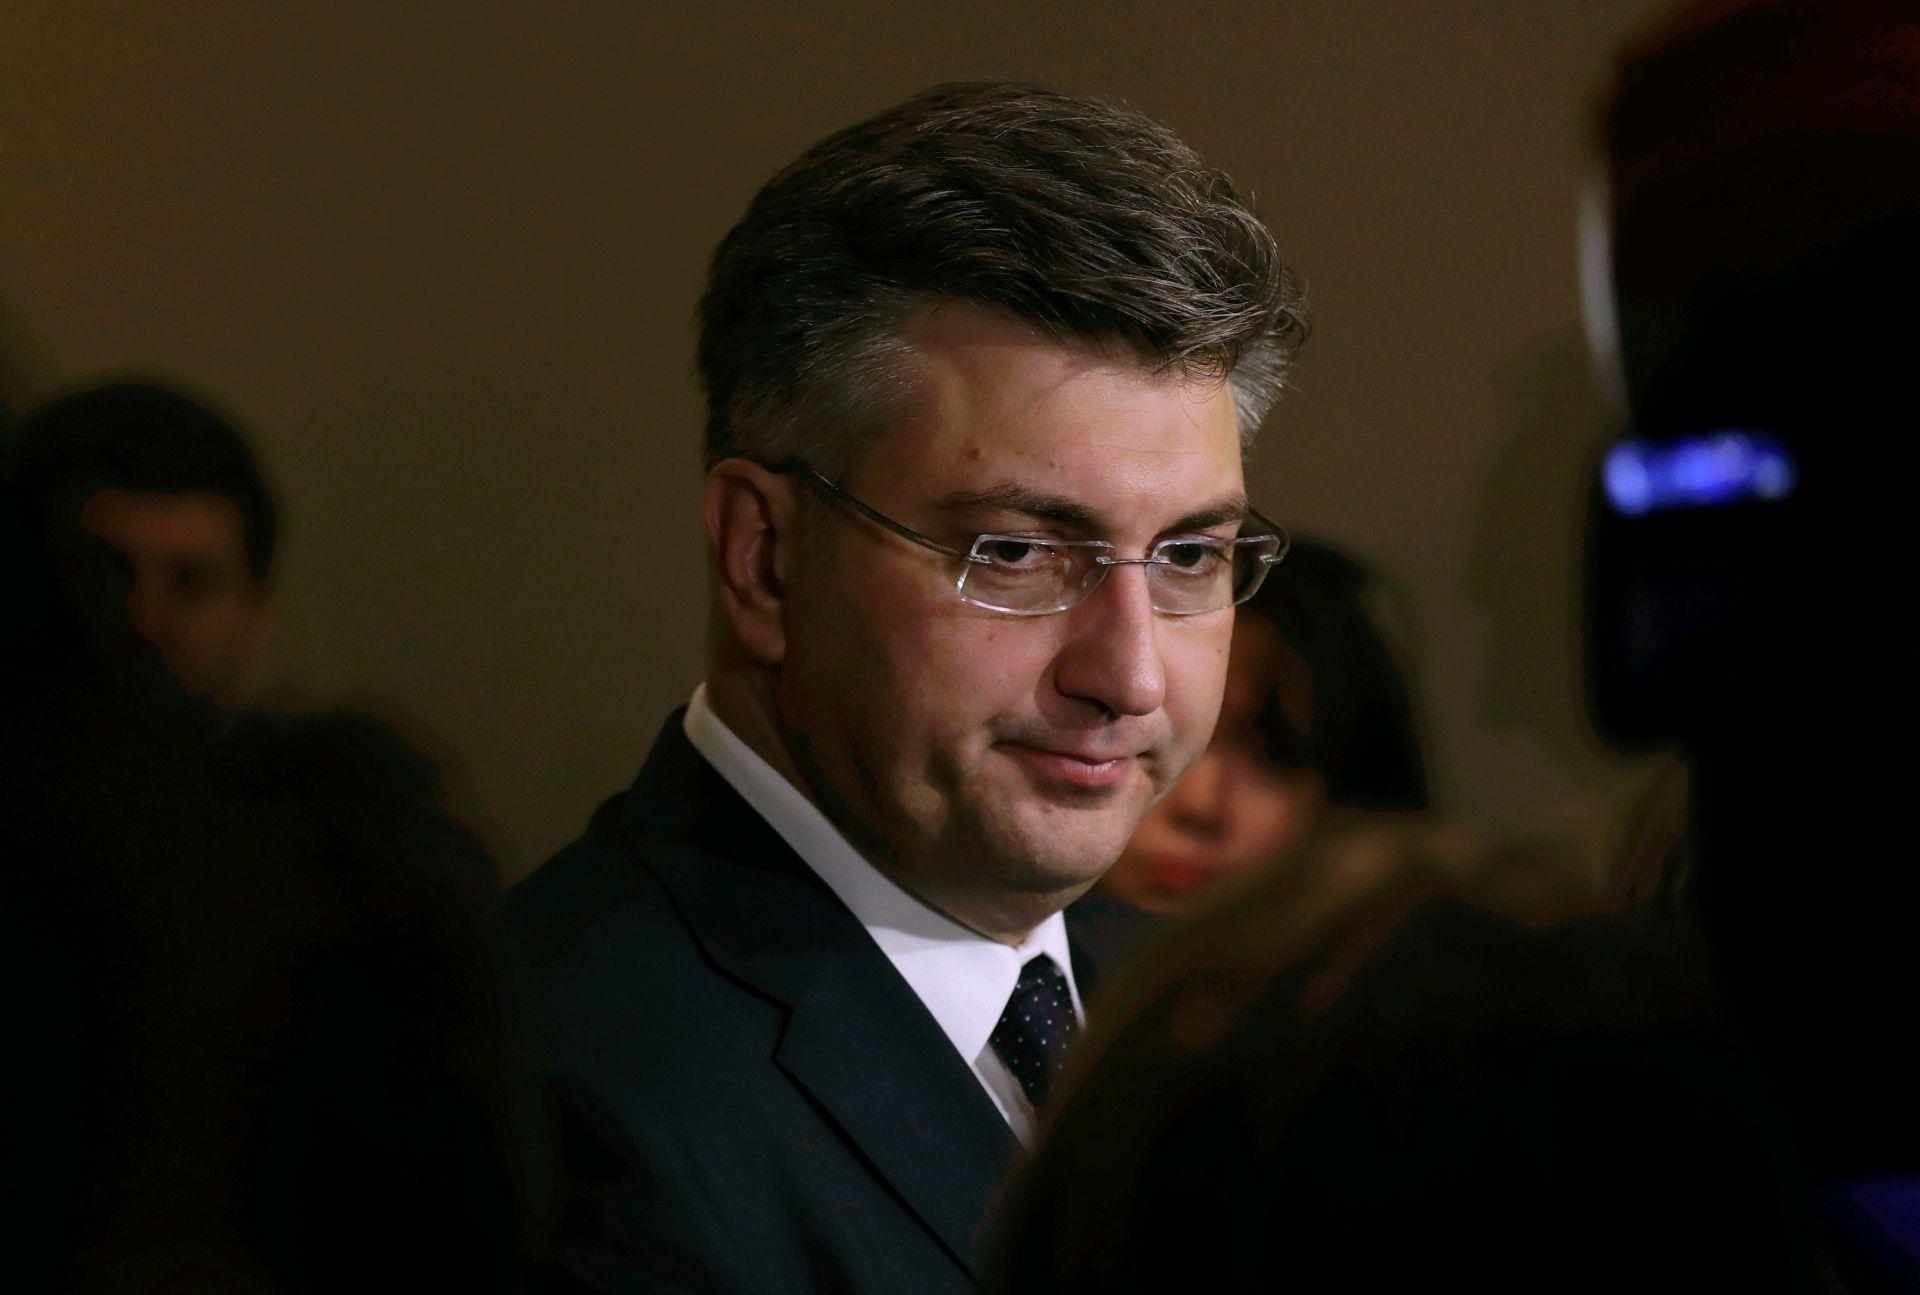 Plenković komentirao sastananak Dalić s Mađarima